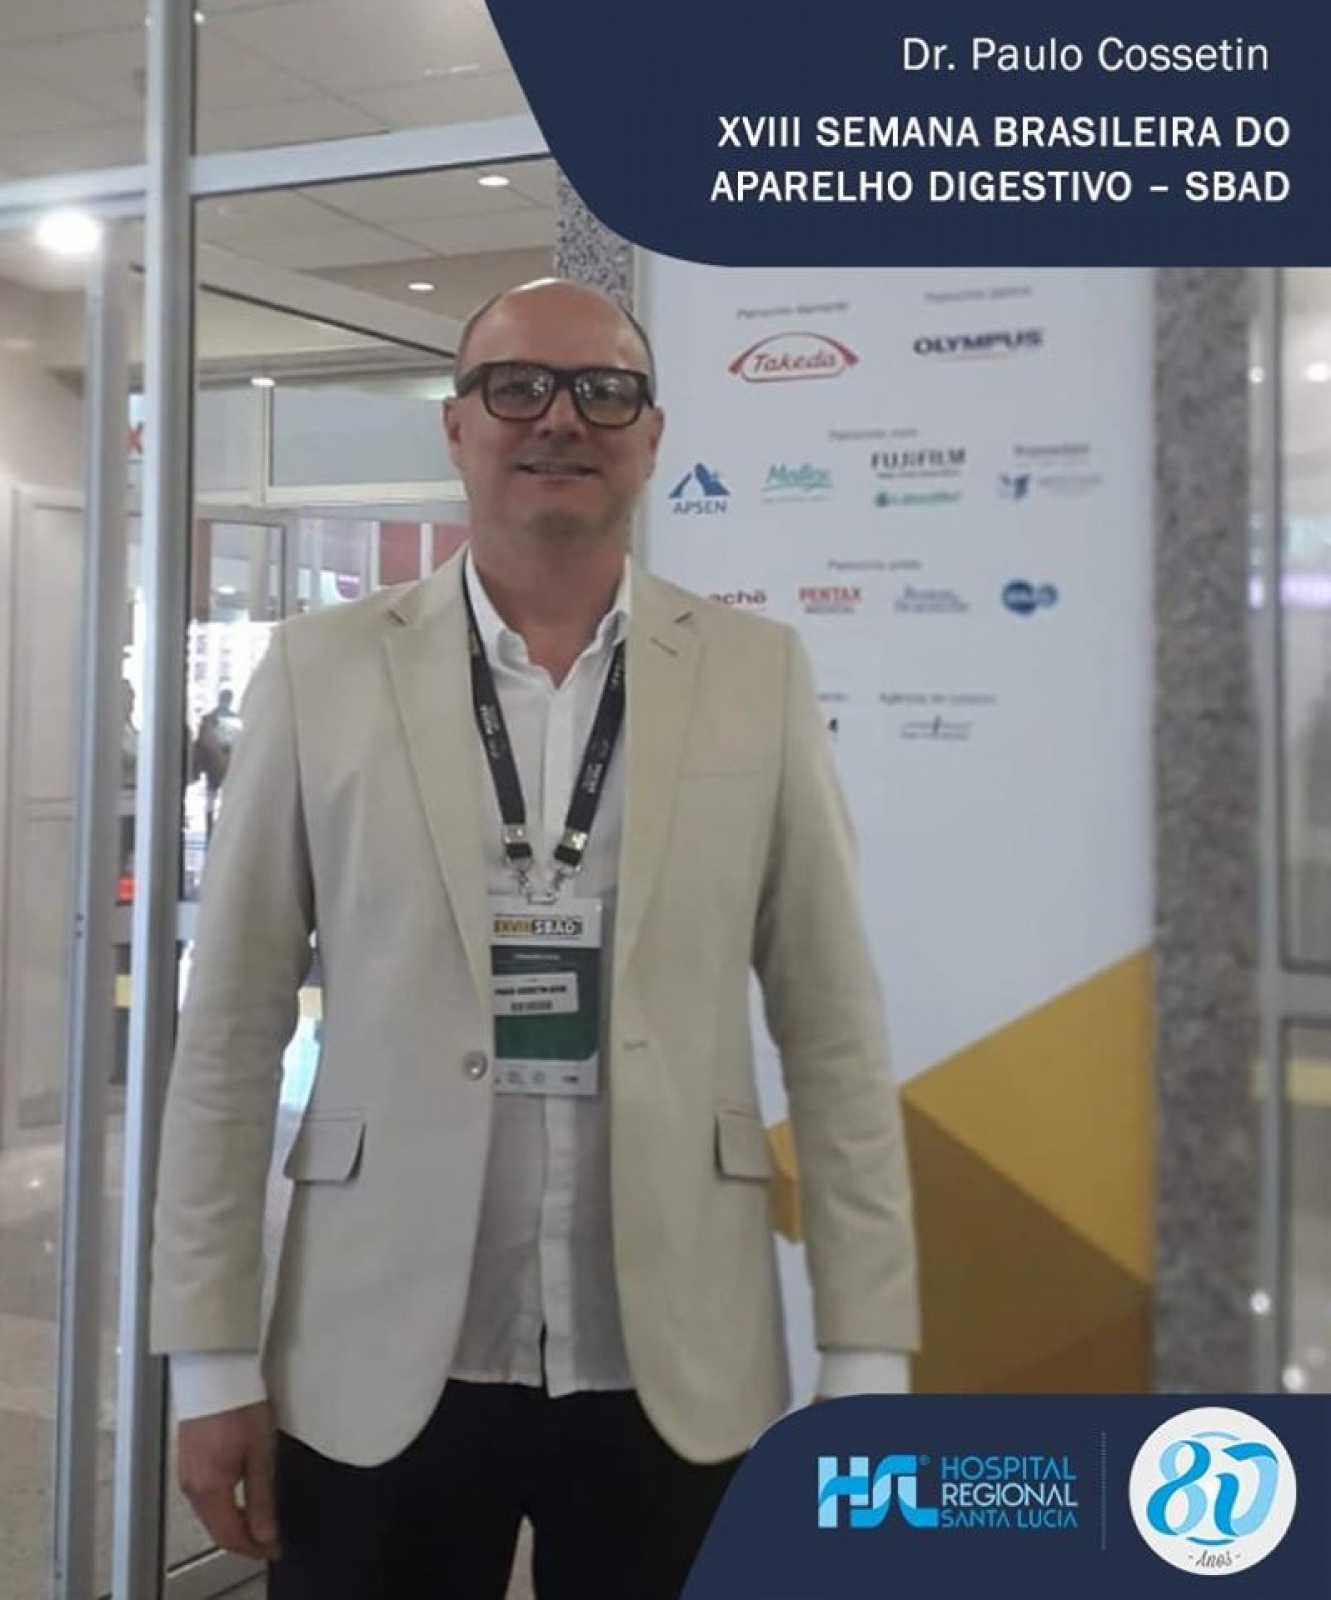 XVIII Semana Brasileira do Aparelho Digestivo – SBAD